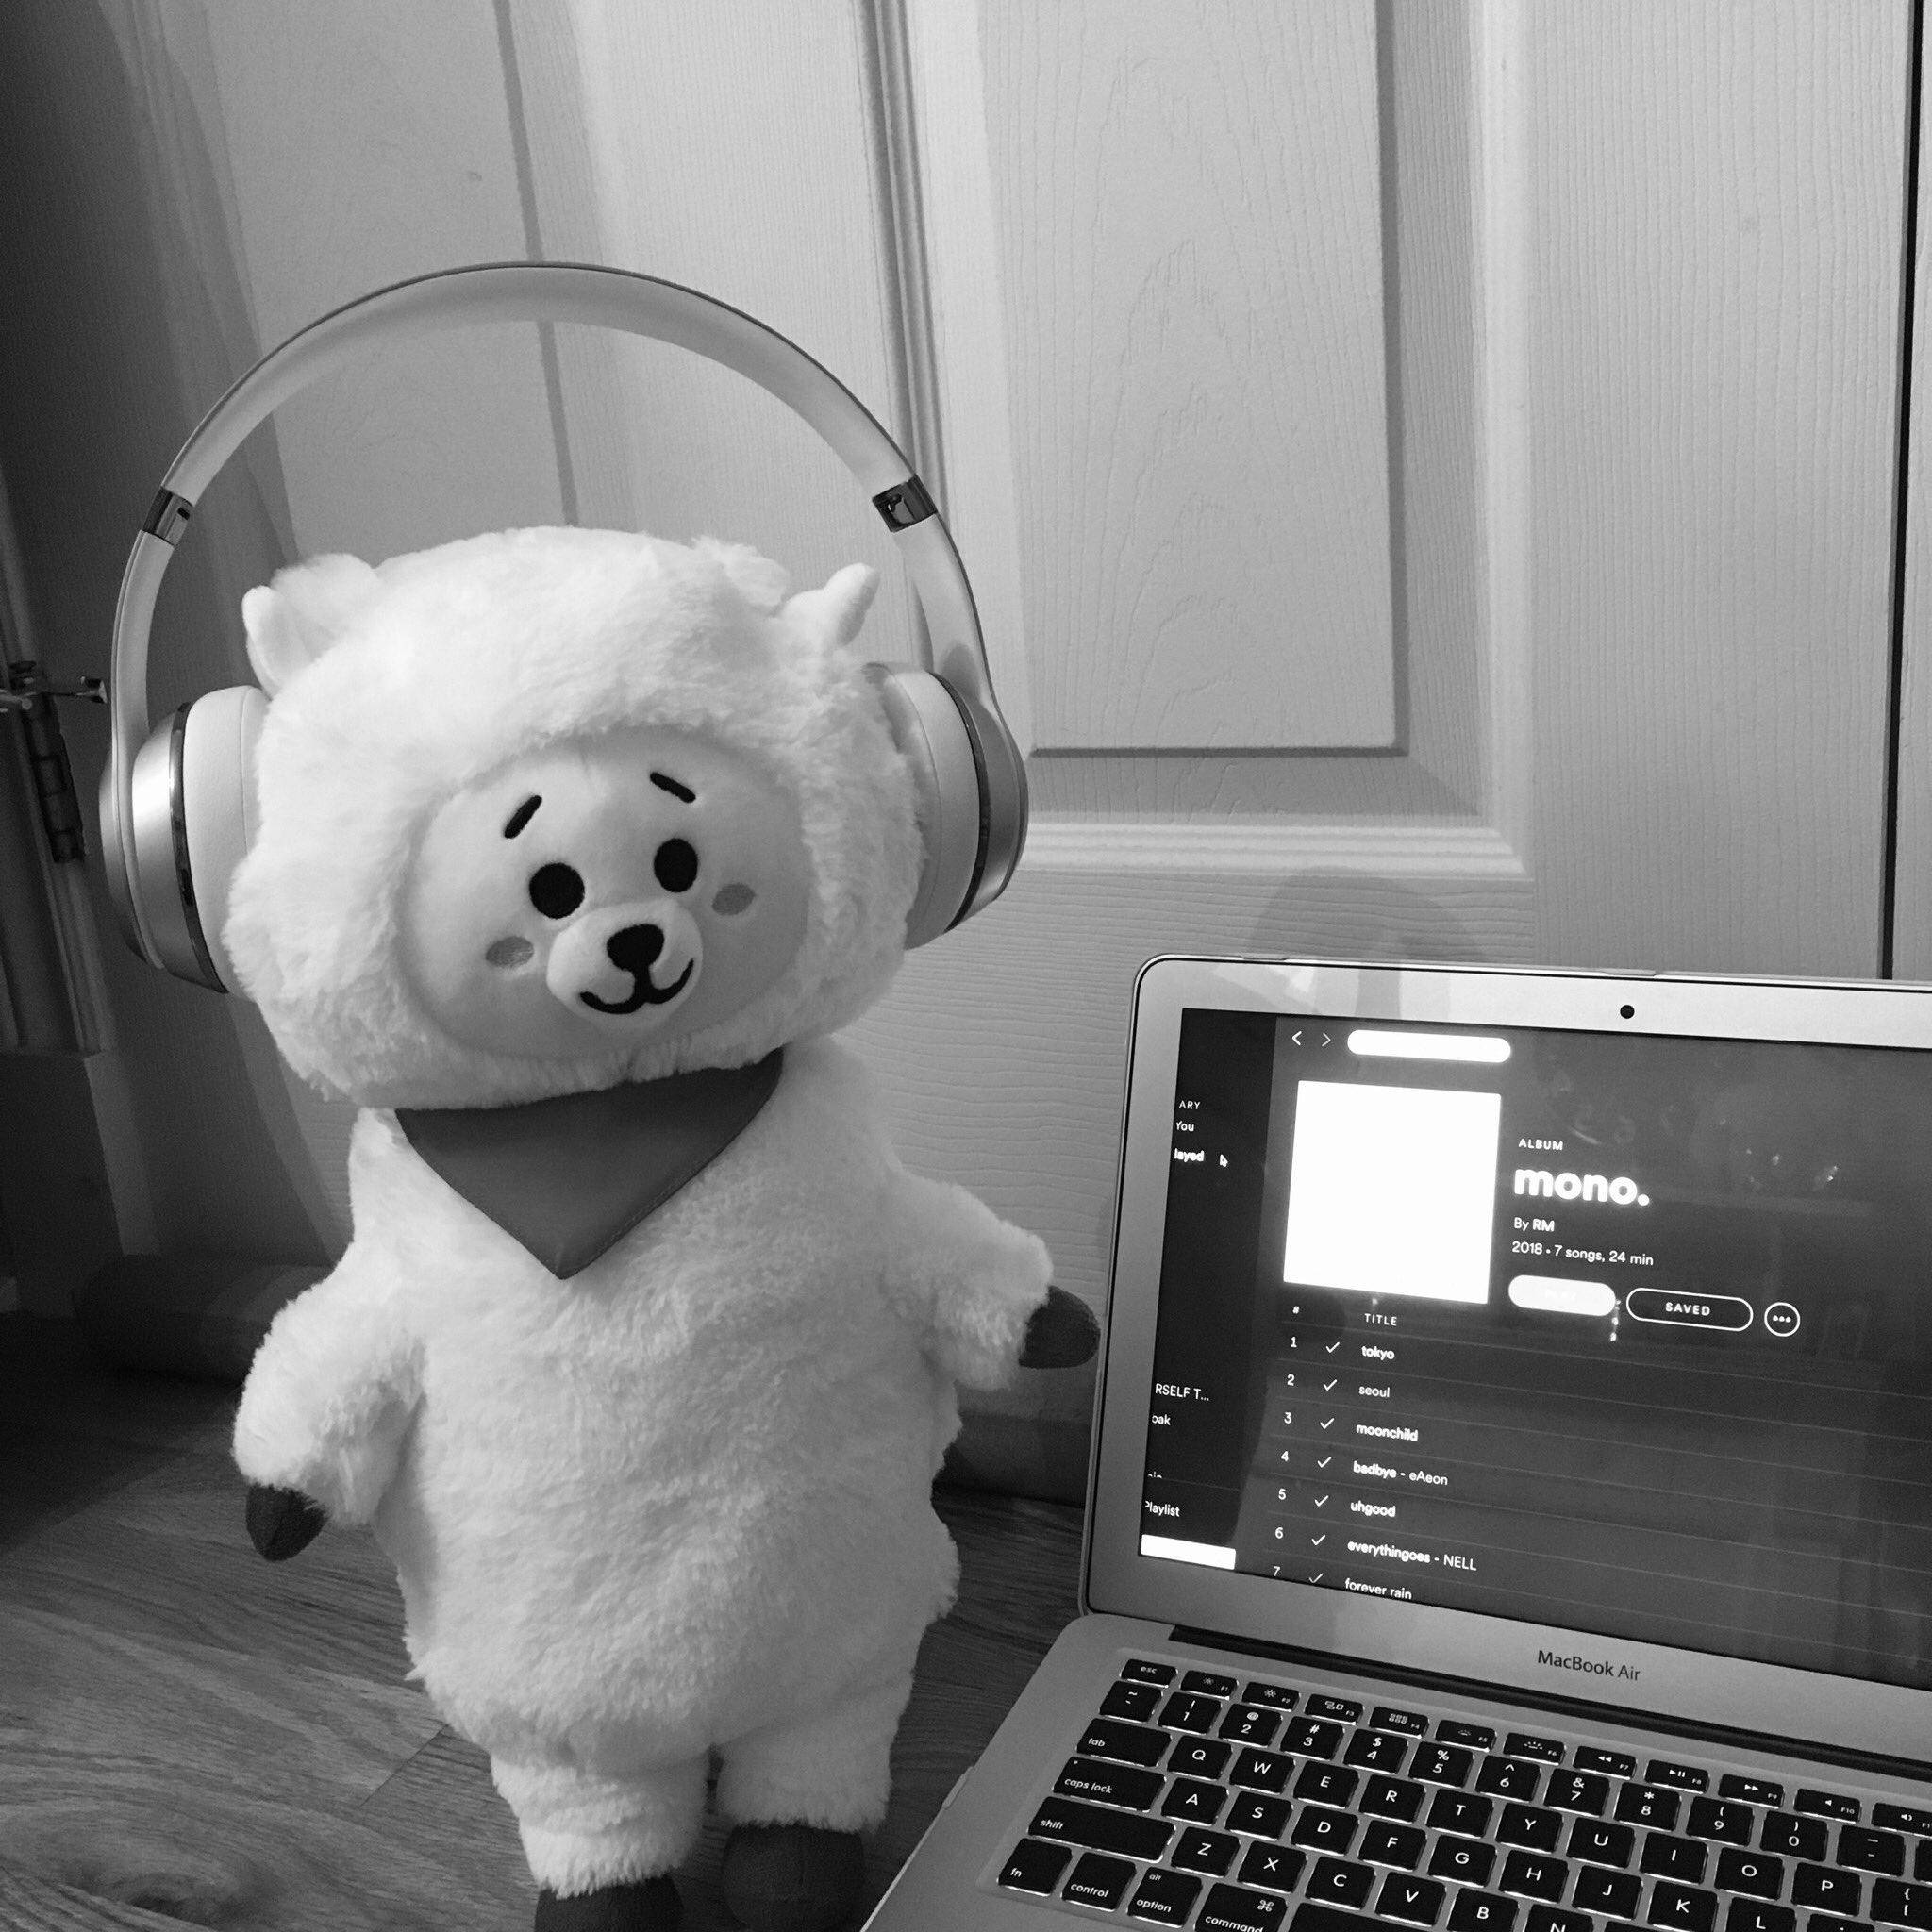 RJ is listening to mono, are you? �� #monoishere   https://t.co/QVtSIbaxk1 https://t.co/qPxthpnD3E